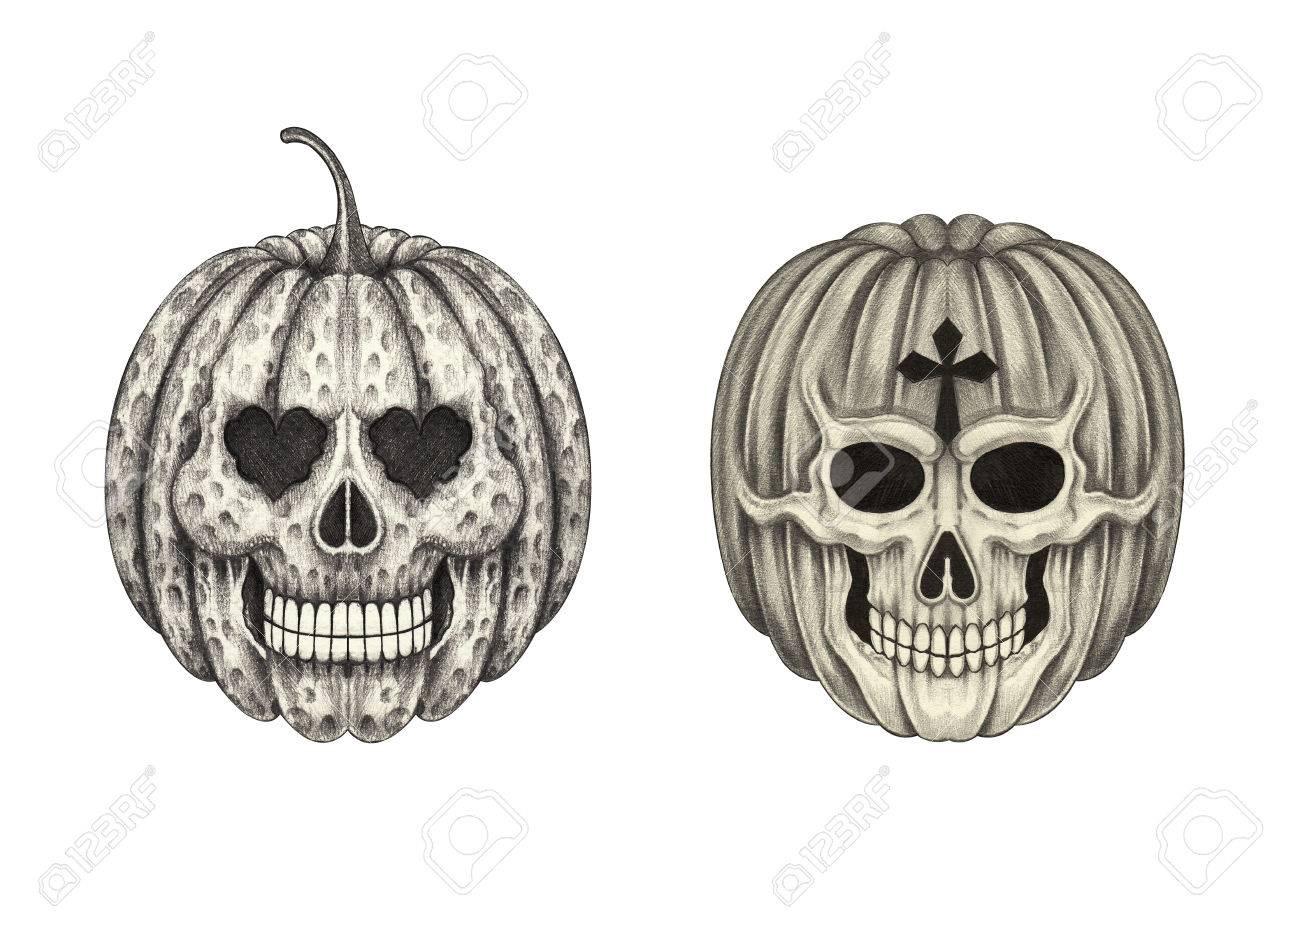 1300x933 Art Pumpkin Skulls.hand Pencil Drawing On Paper. Stock Photo